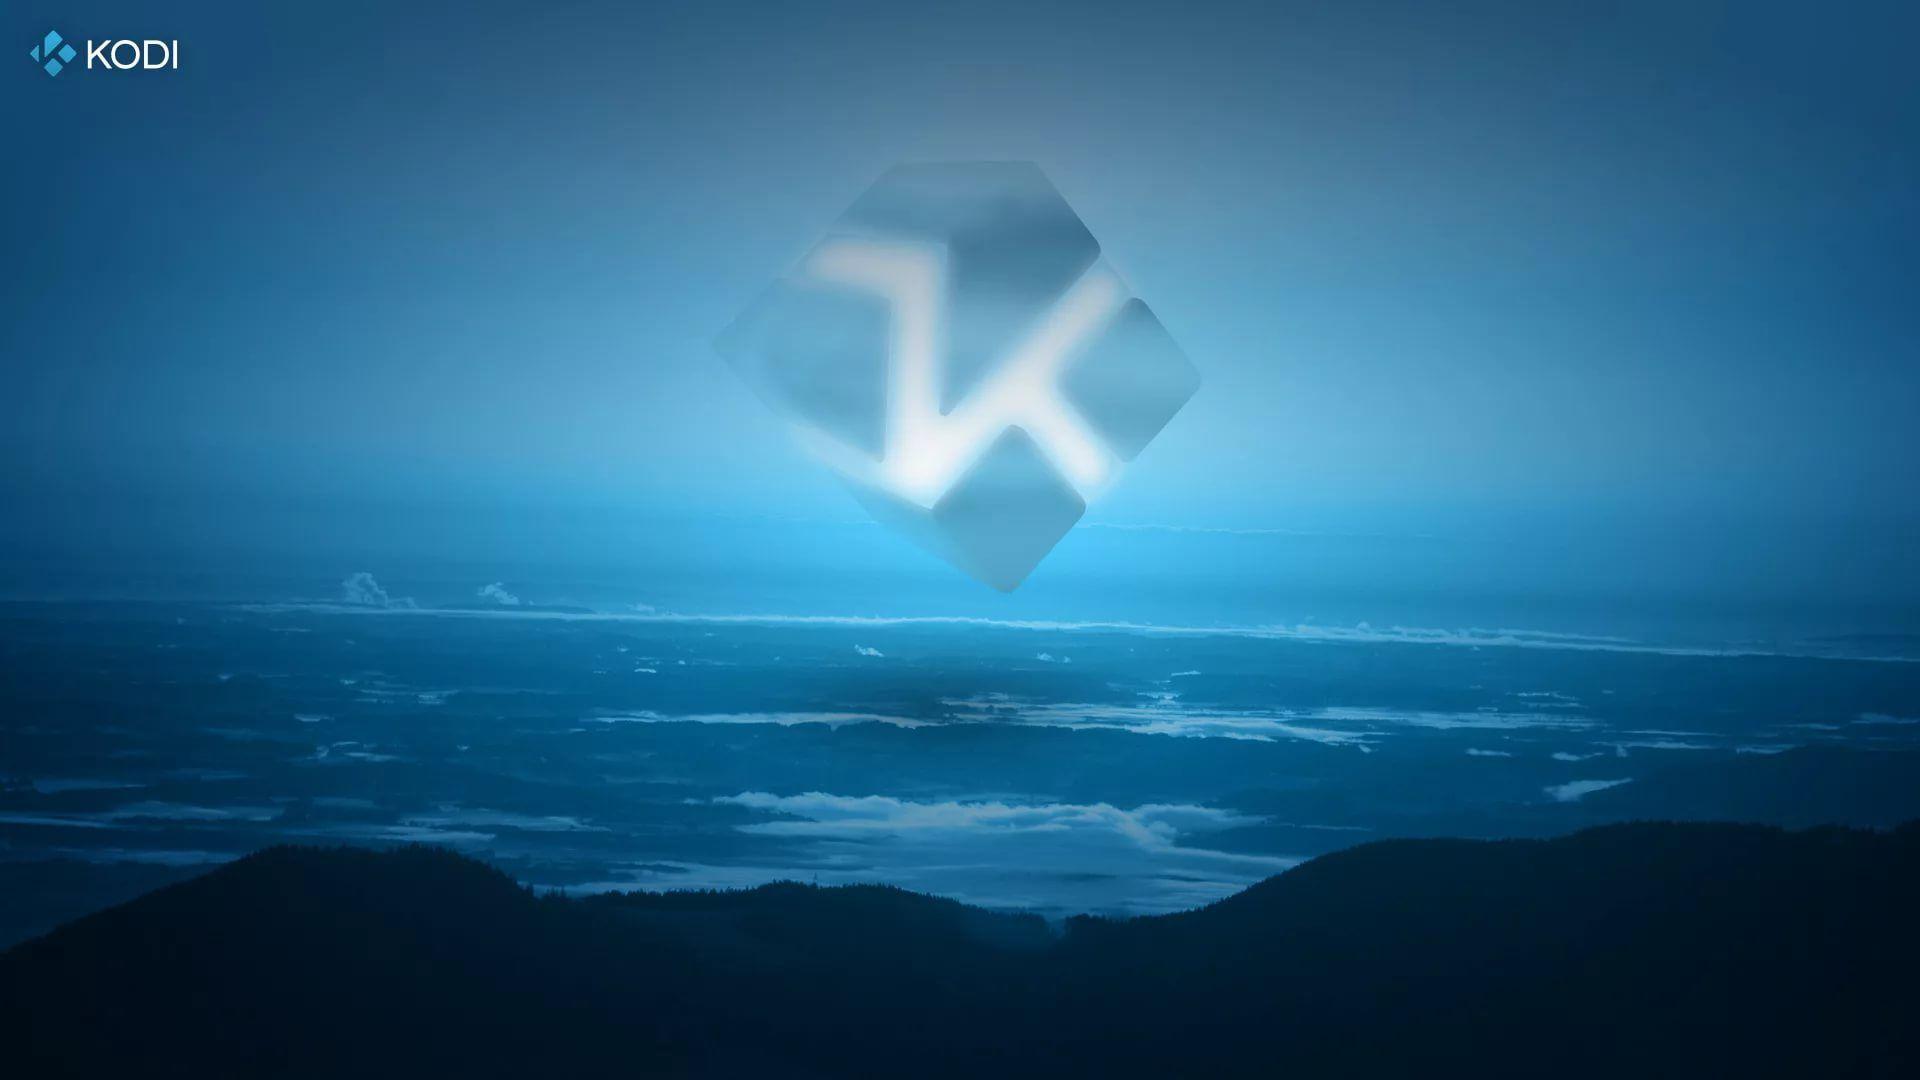 Kodi full screen hd wallpaper